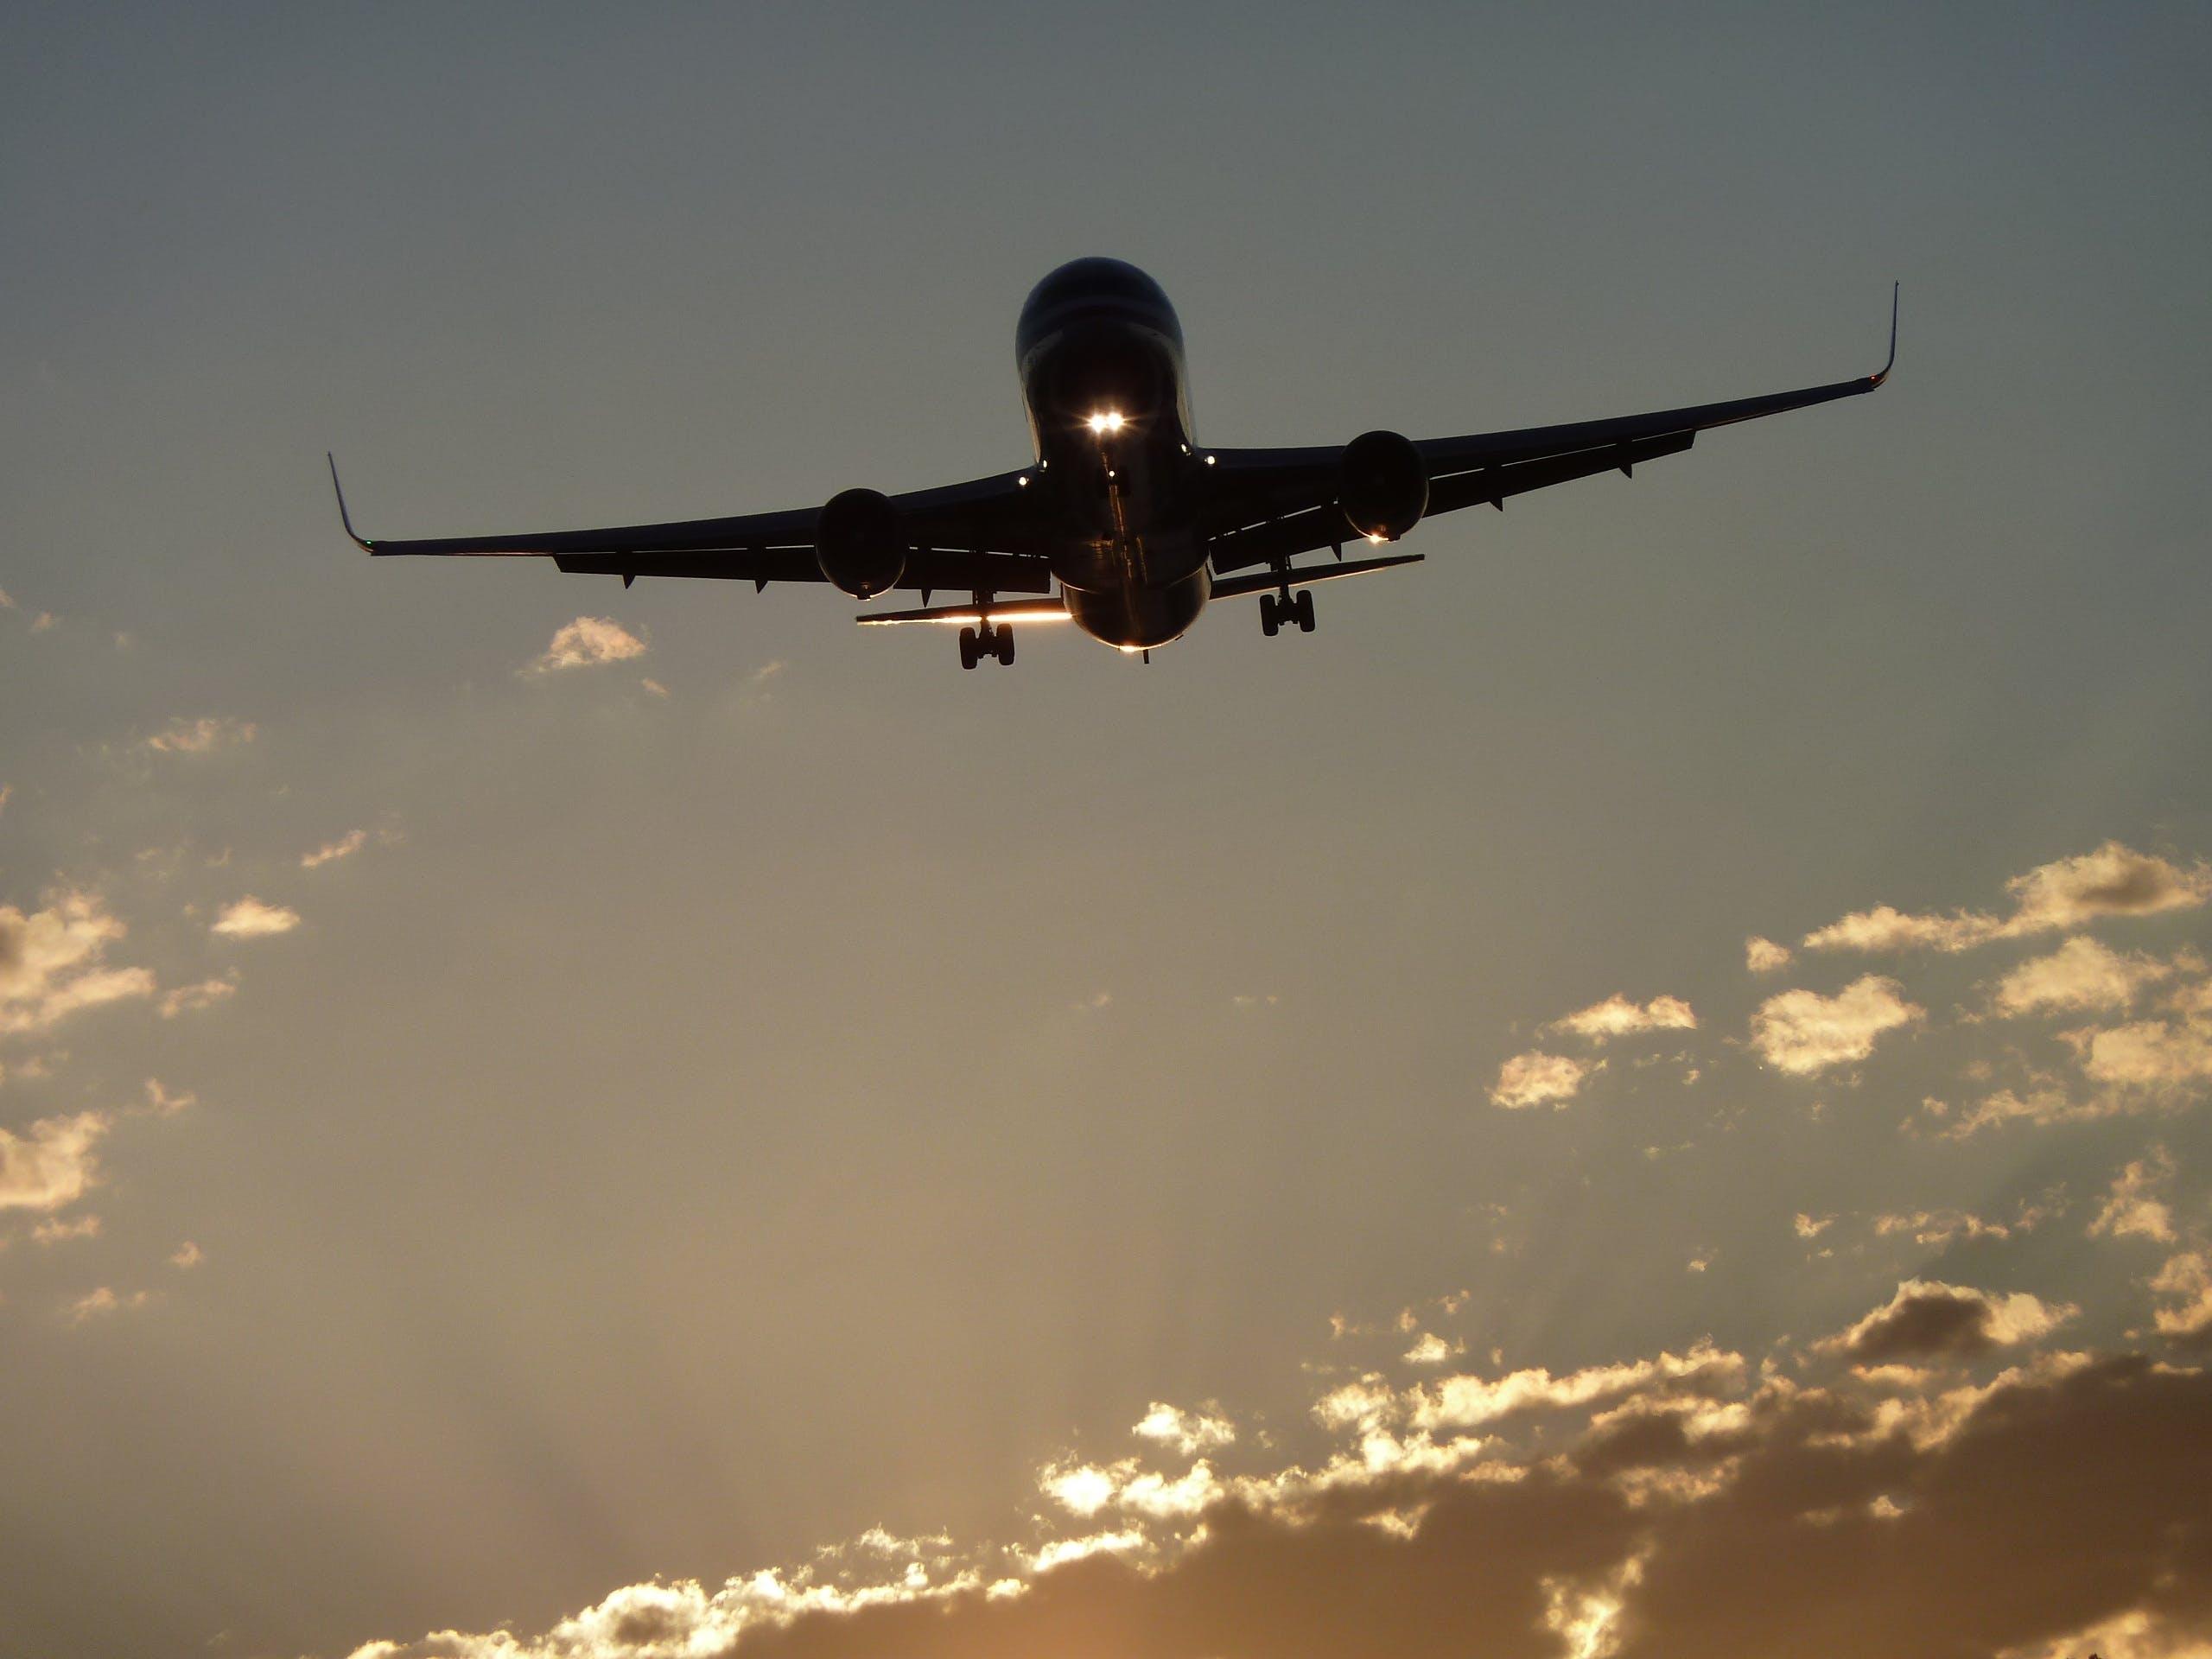 Kostenloses Stock Foto zu flug, dämmerung, himmel, silhouette